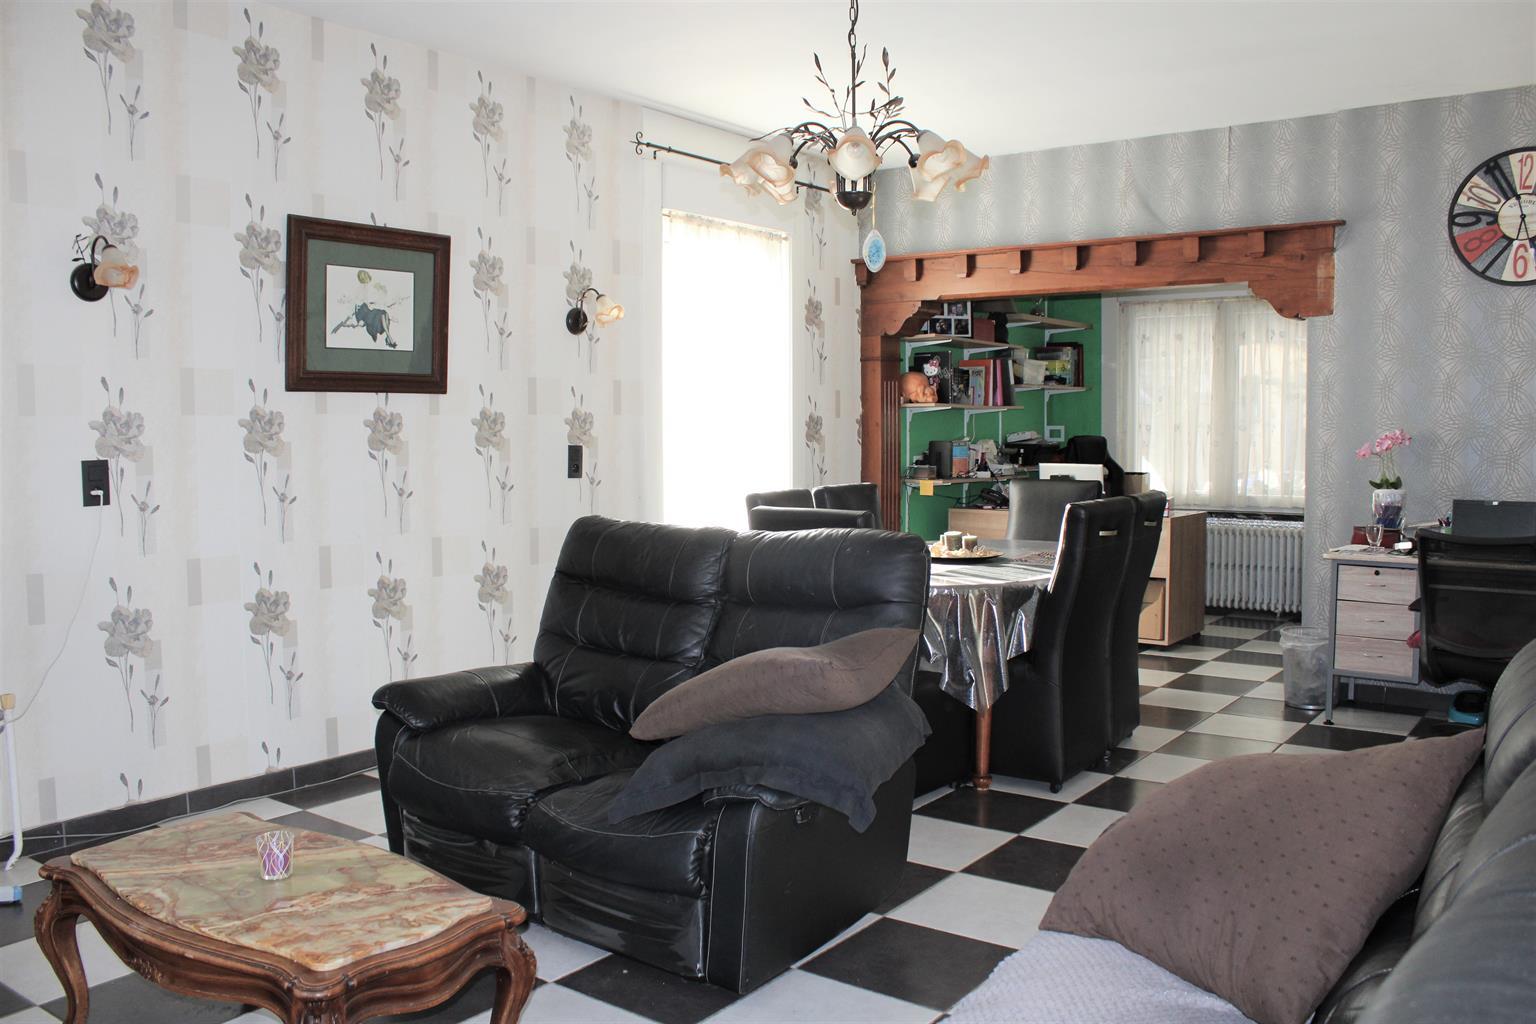 Maison - Antoing Calonne - #4297159-5